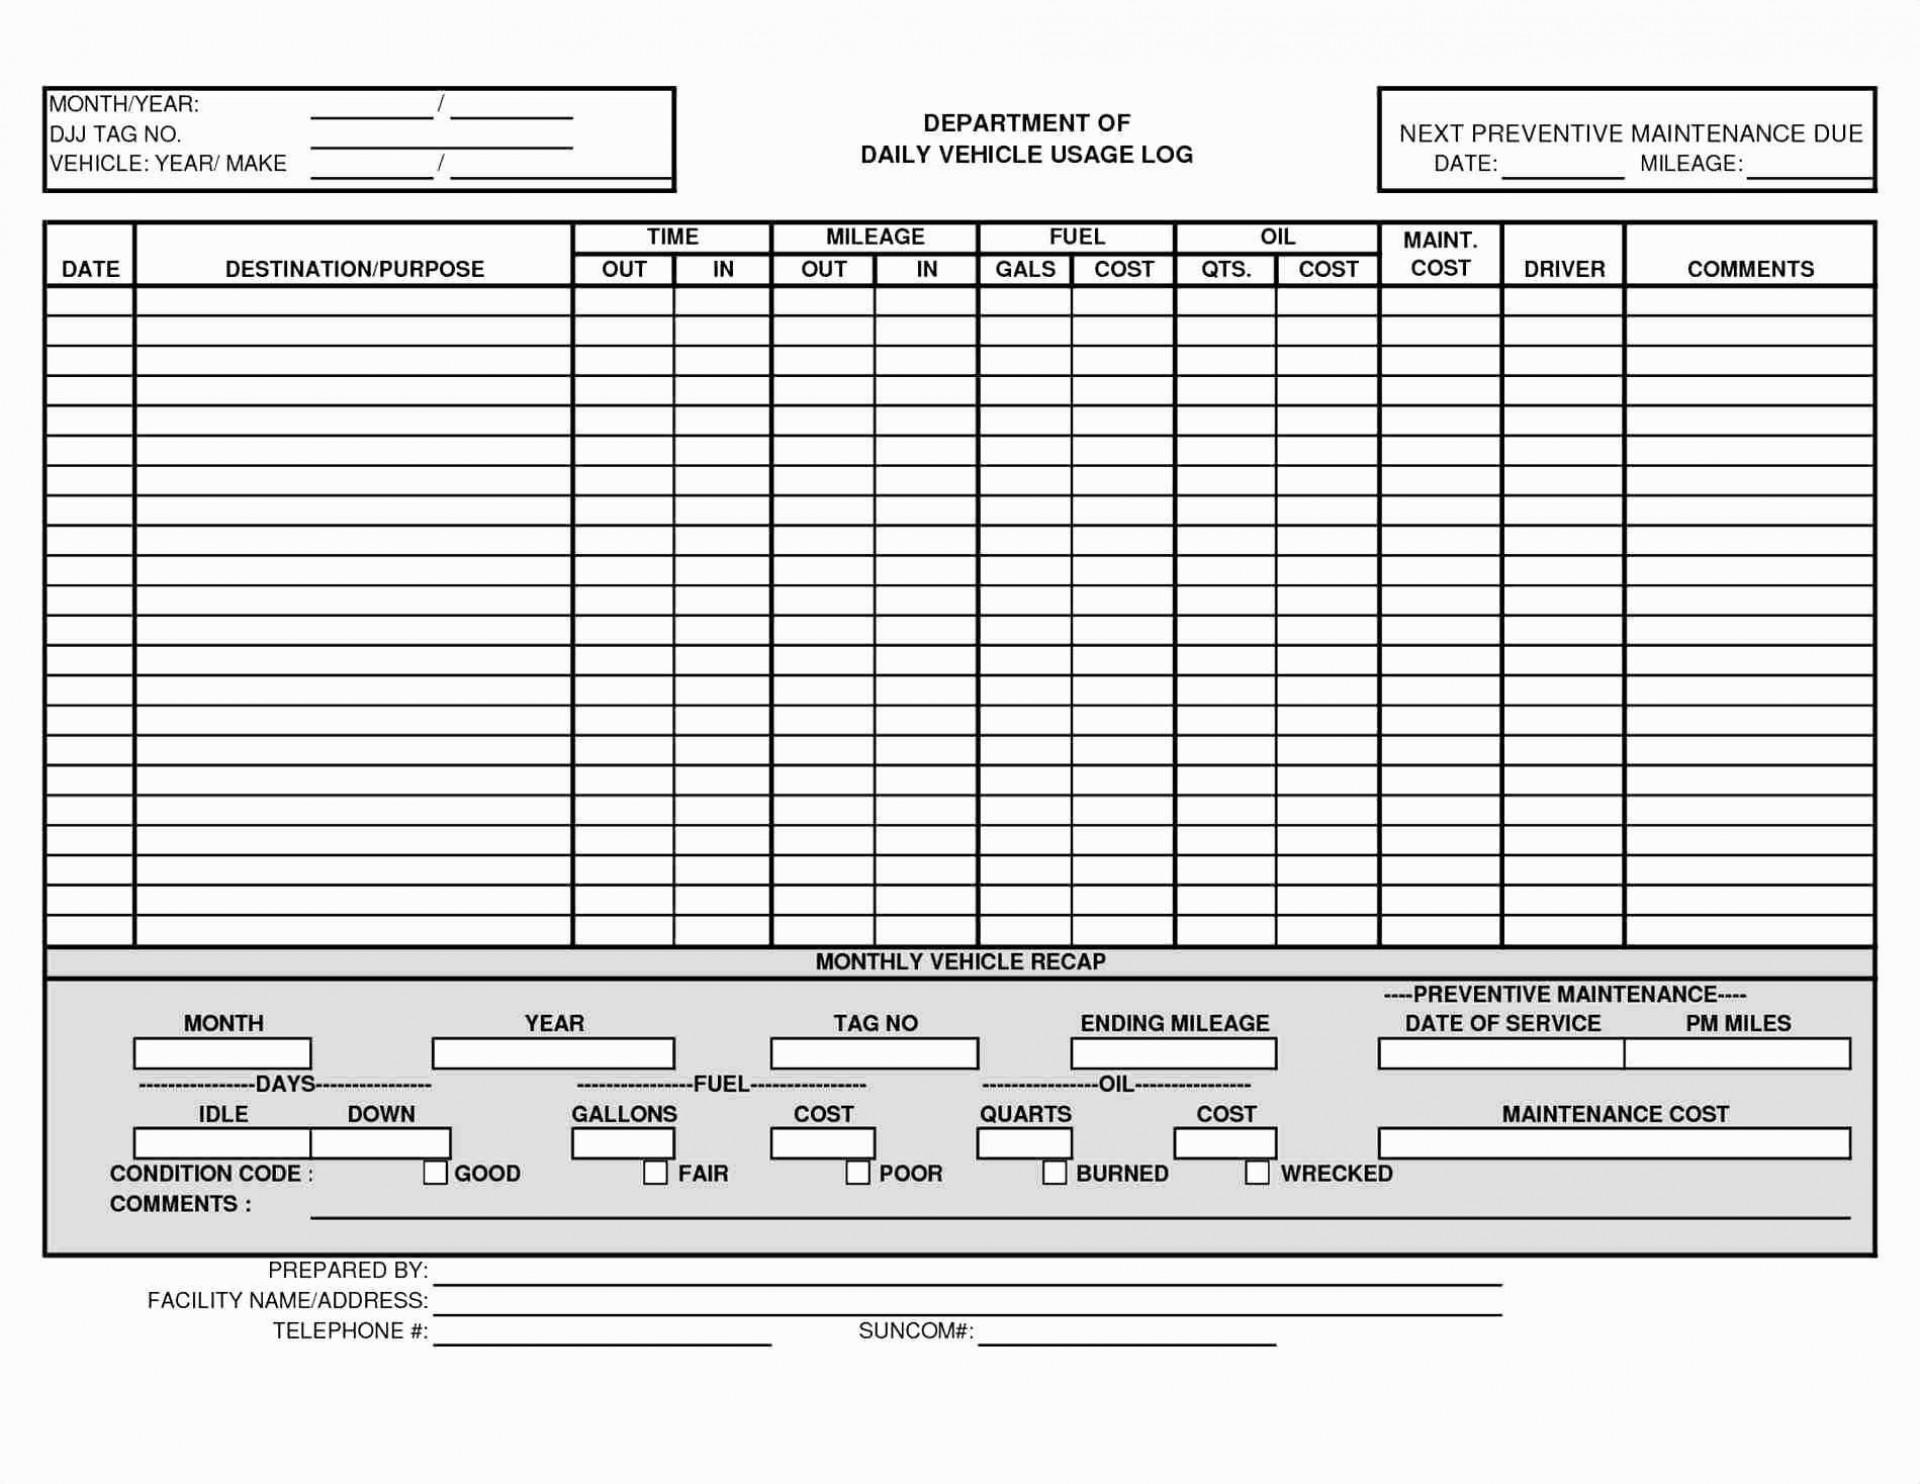 009 Top Vehicle Maintenance Log Template High Definition  Microsoft Car1920